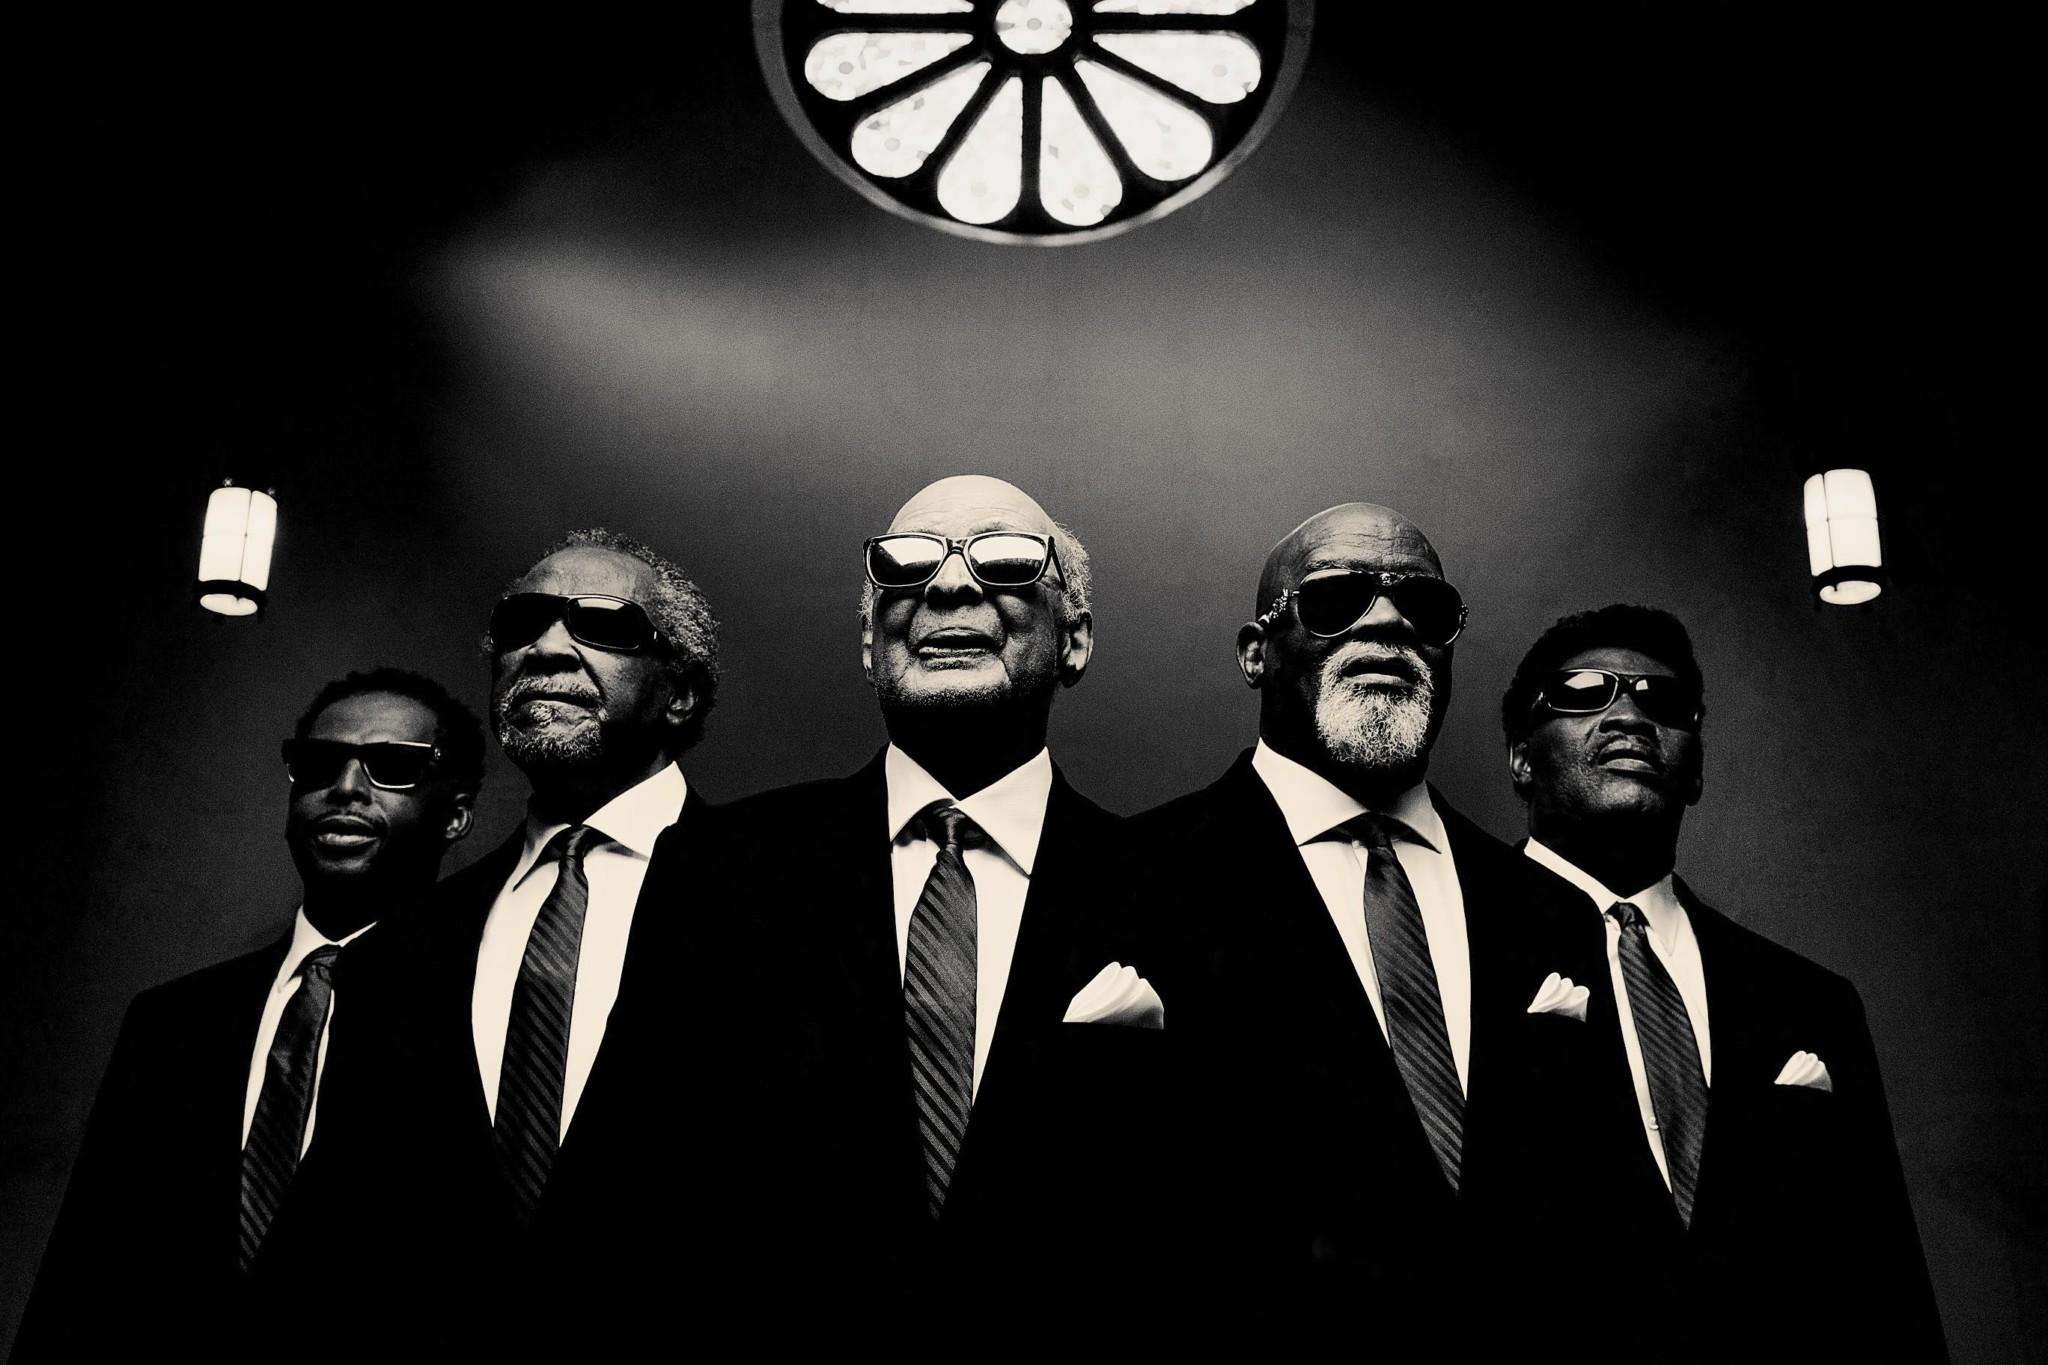 The Blind Boys of Alabama with Ben Heppner Launch  the Chan Centre's Landmark 20thAnniversary Season